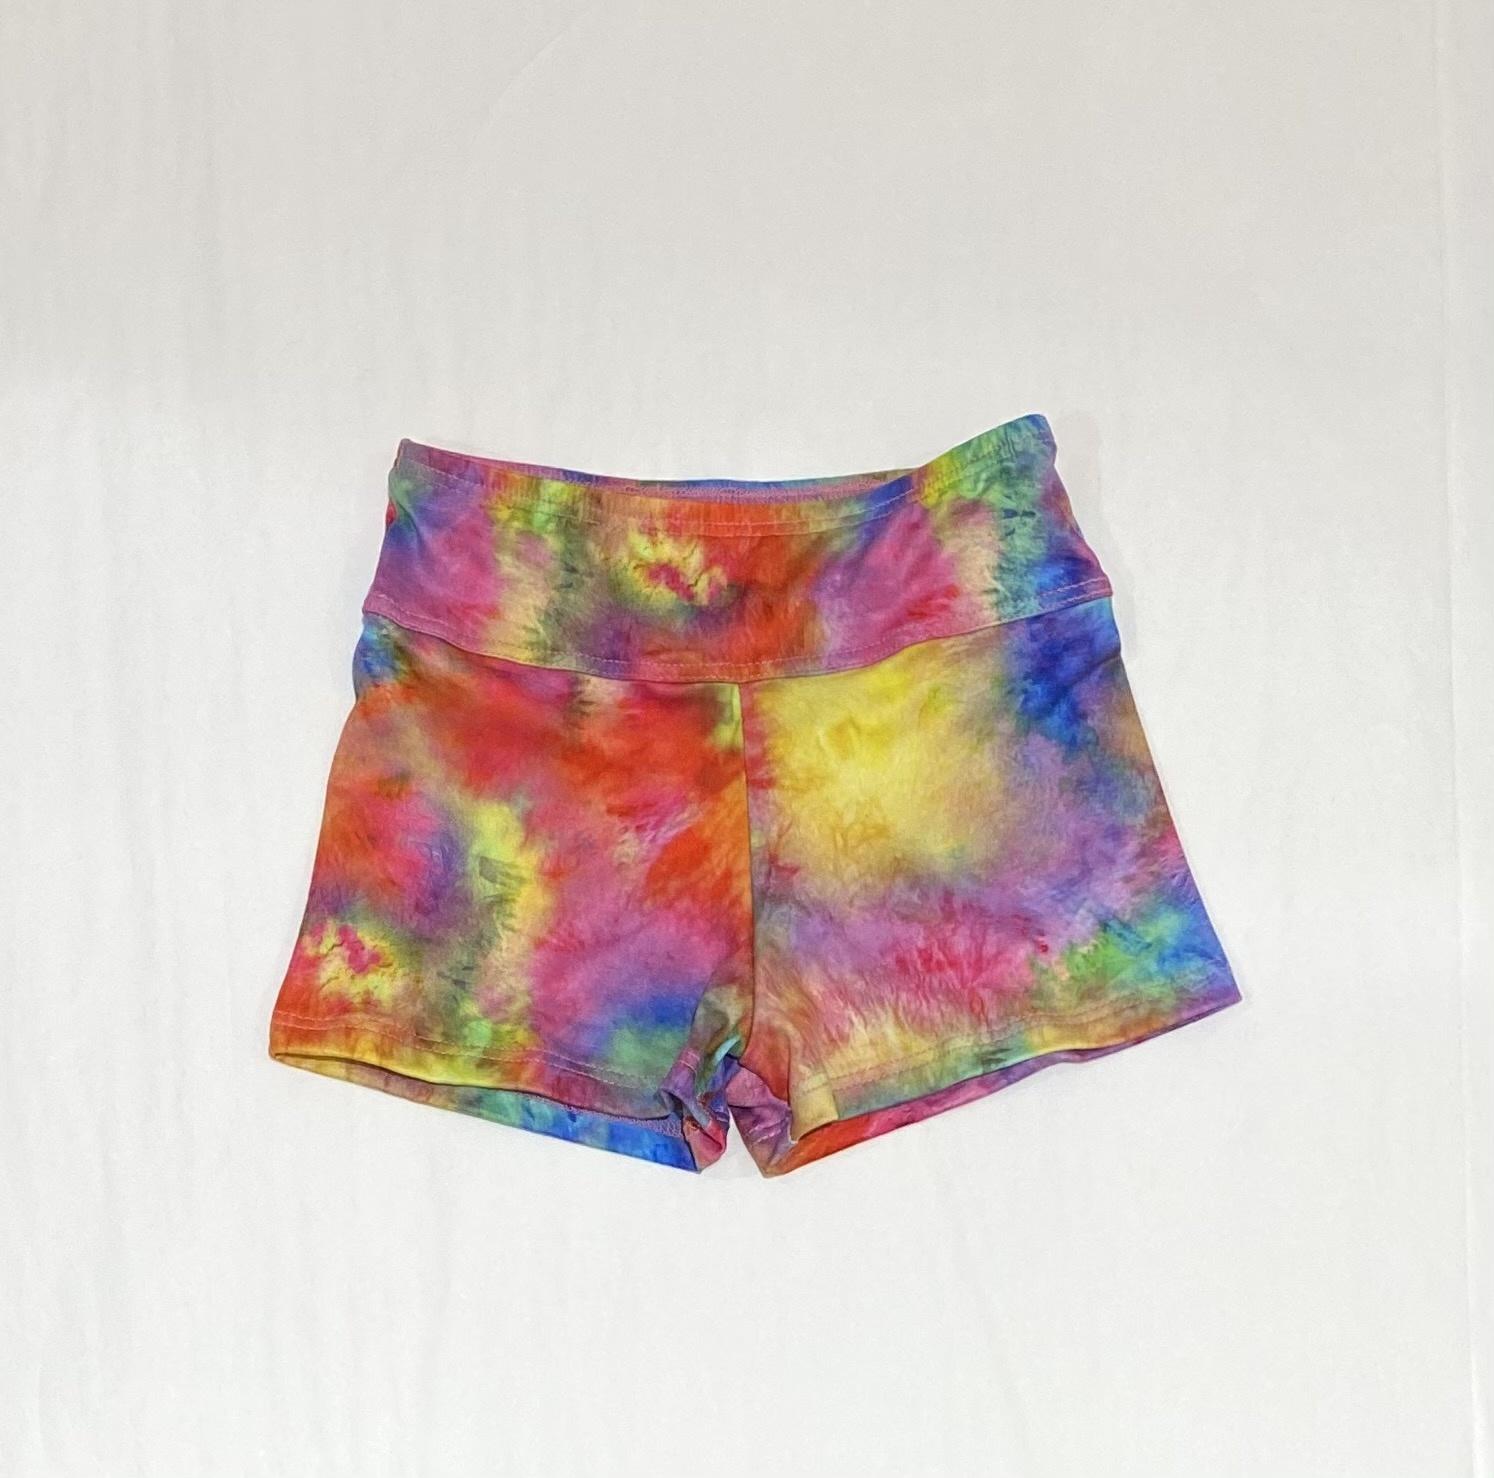 Social Butterfly Sport Short, Bright Dye